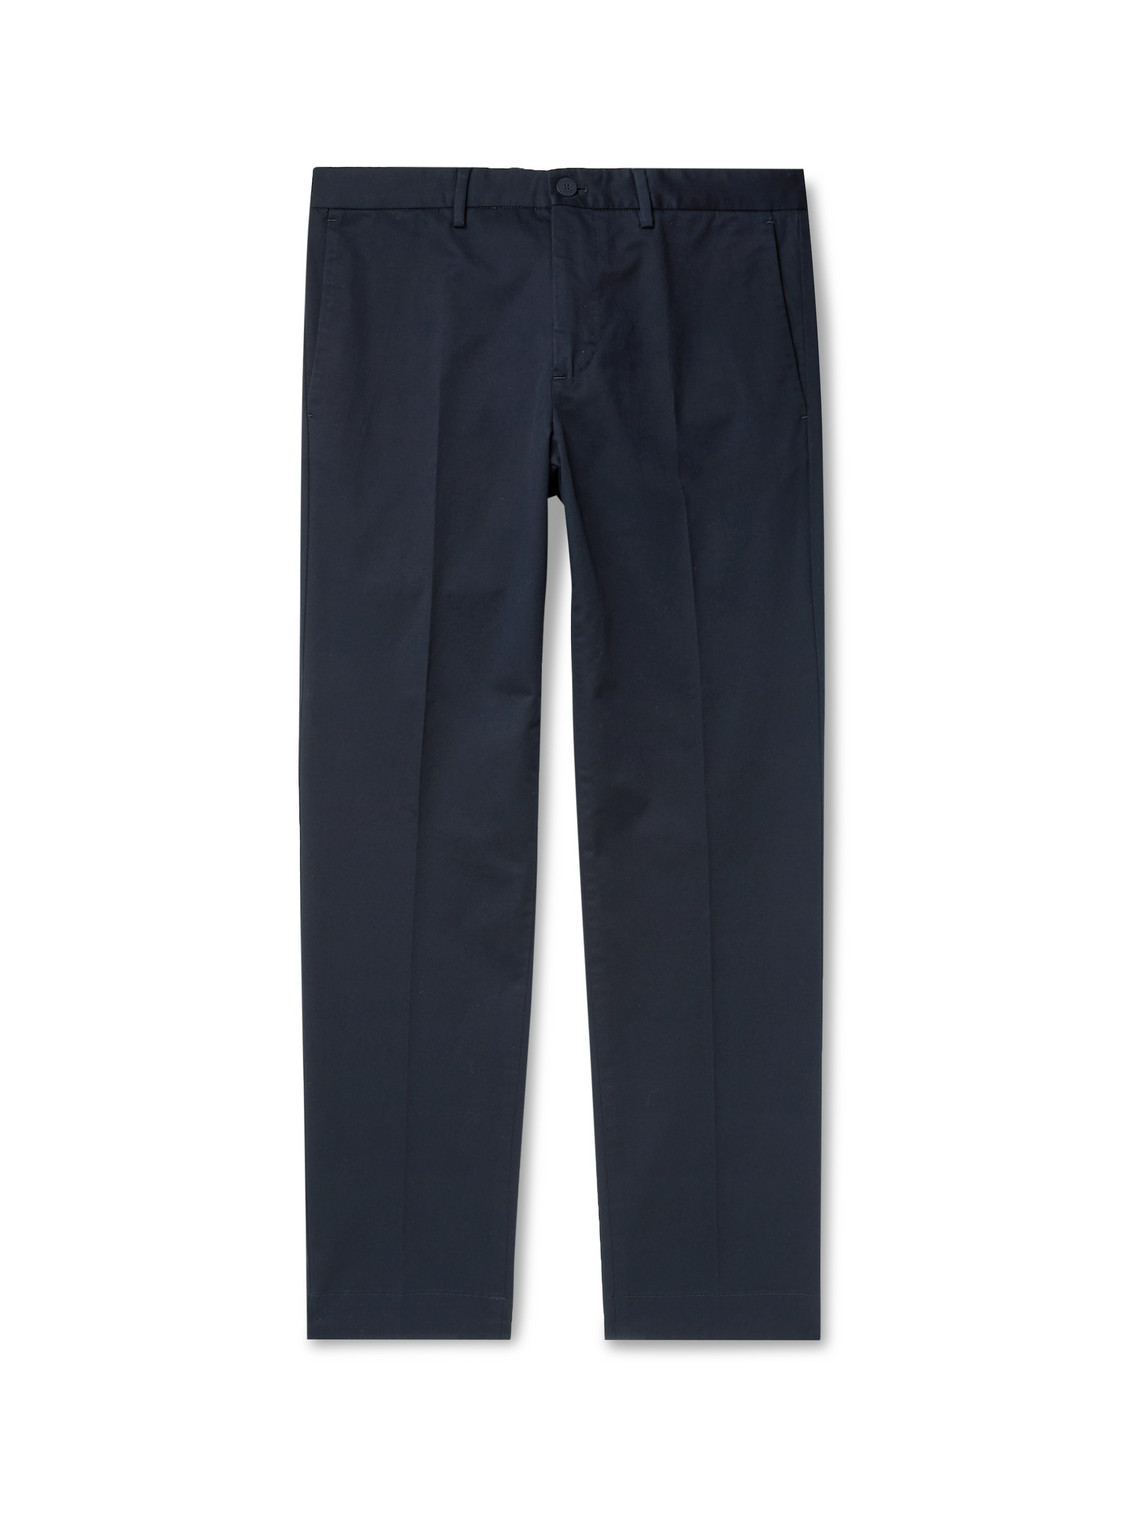 incotex - slim-fit stretch-cotton twill trousers - men - blue - it 56